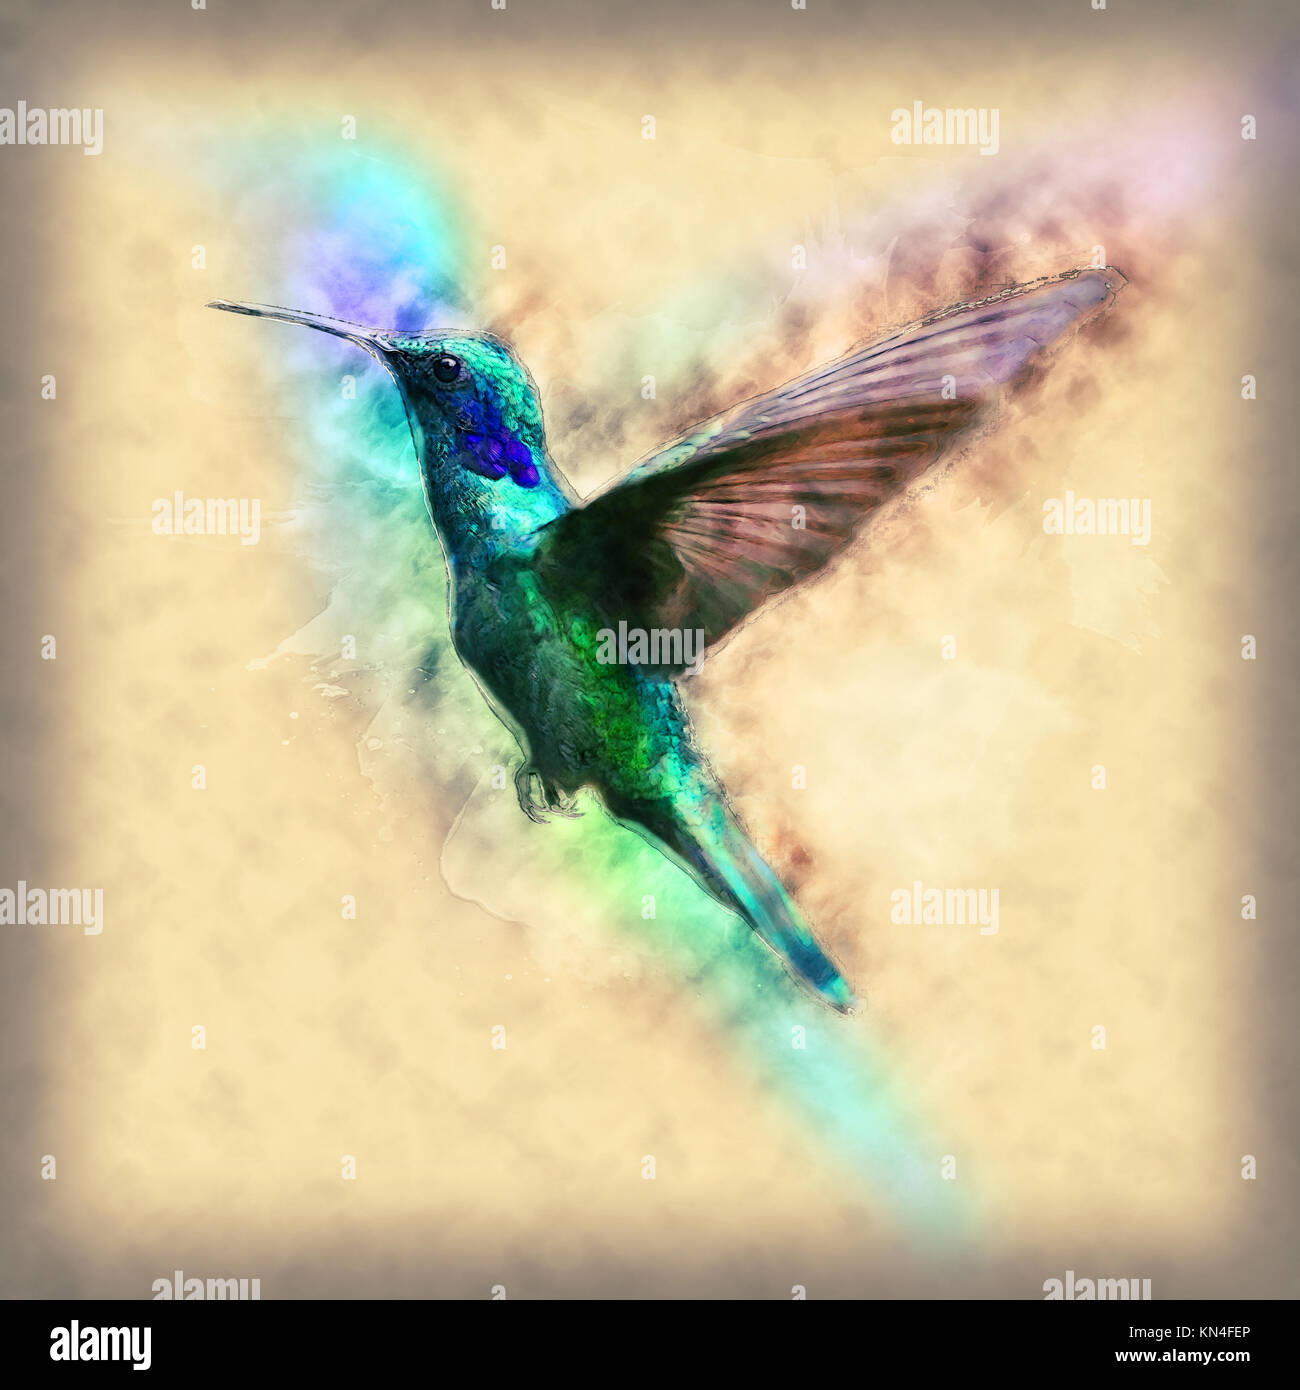 Digitally enhanced image a hovering hummingbird - Stock Image